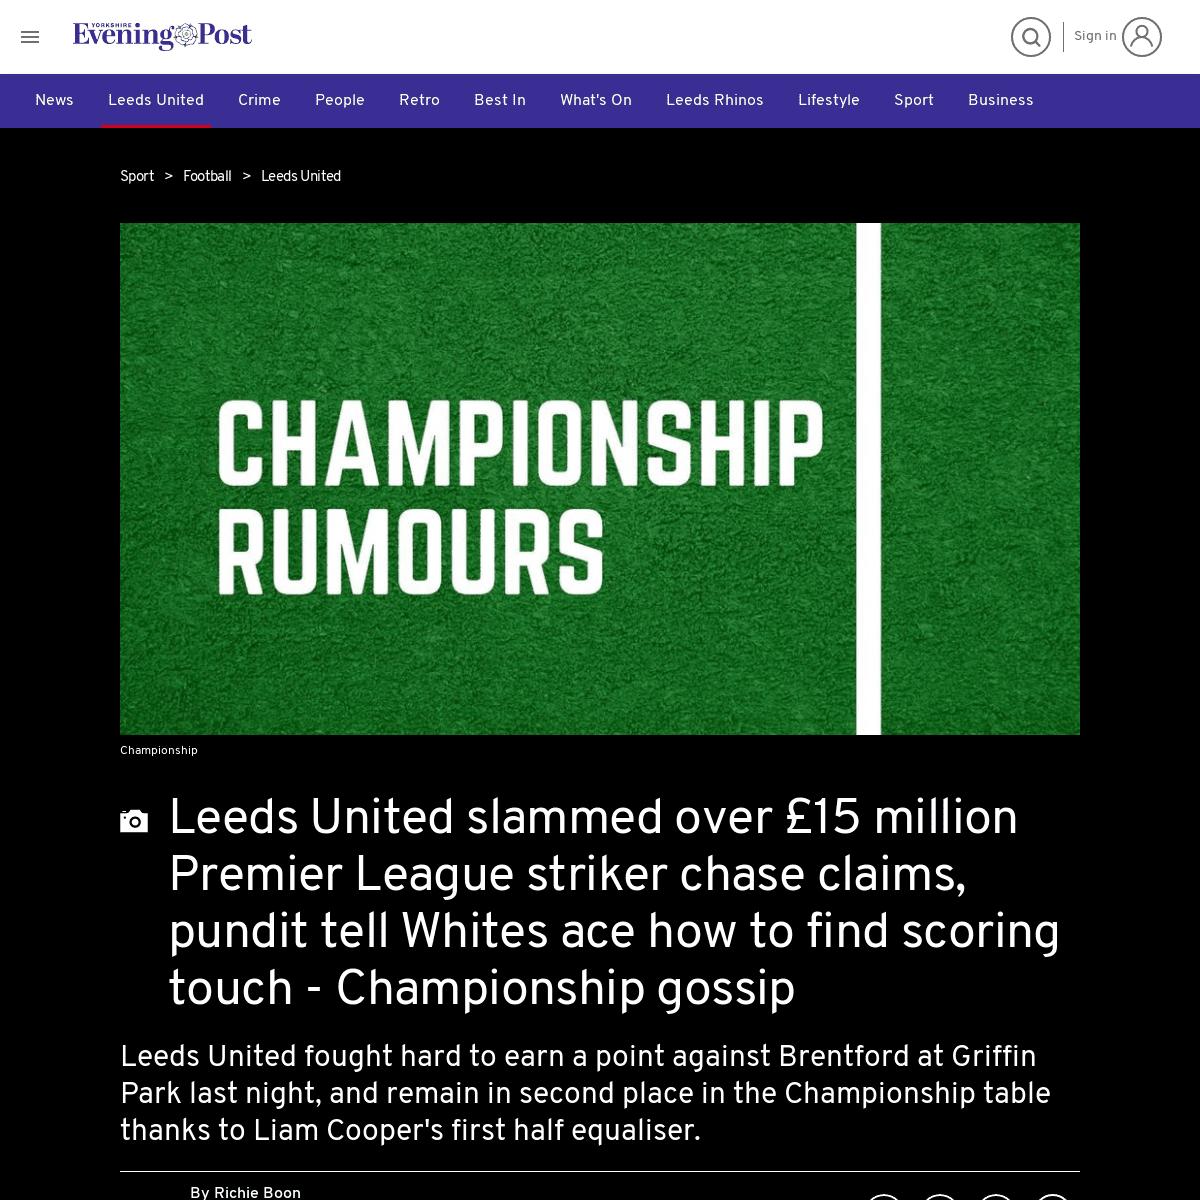 ArchiveBay.com - www.yorkshireeveningpost.co.uk/sport/football/leeds-united/leeds-united-slammed-over-ps15-million-premier-league-striker-chase-claims-pundit-tell-whites-ace-how-find-scoring-touch-championship-gossip-1479949 - Leeds United slammed over £15 million Premier League striker chase claims, pundit tell Whites ace how to find scoring touch - C